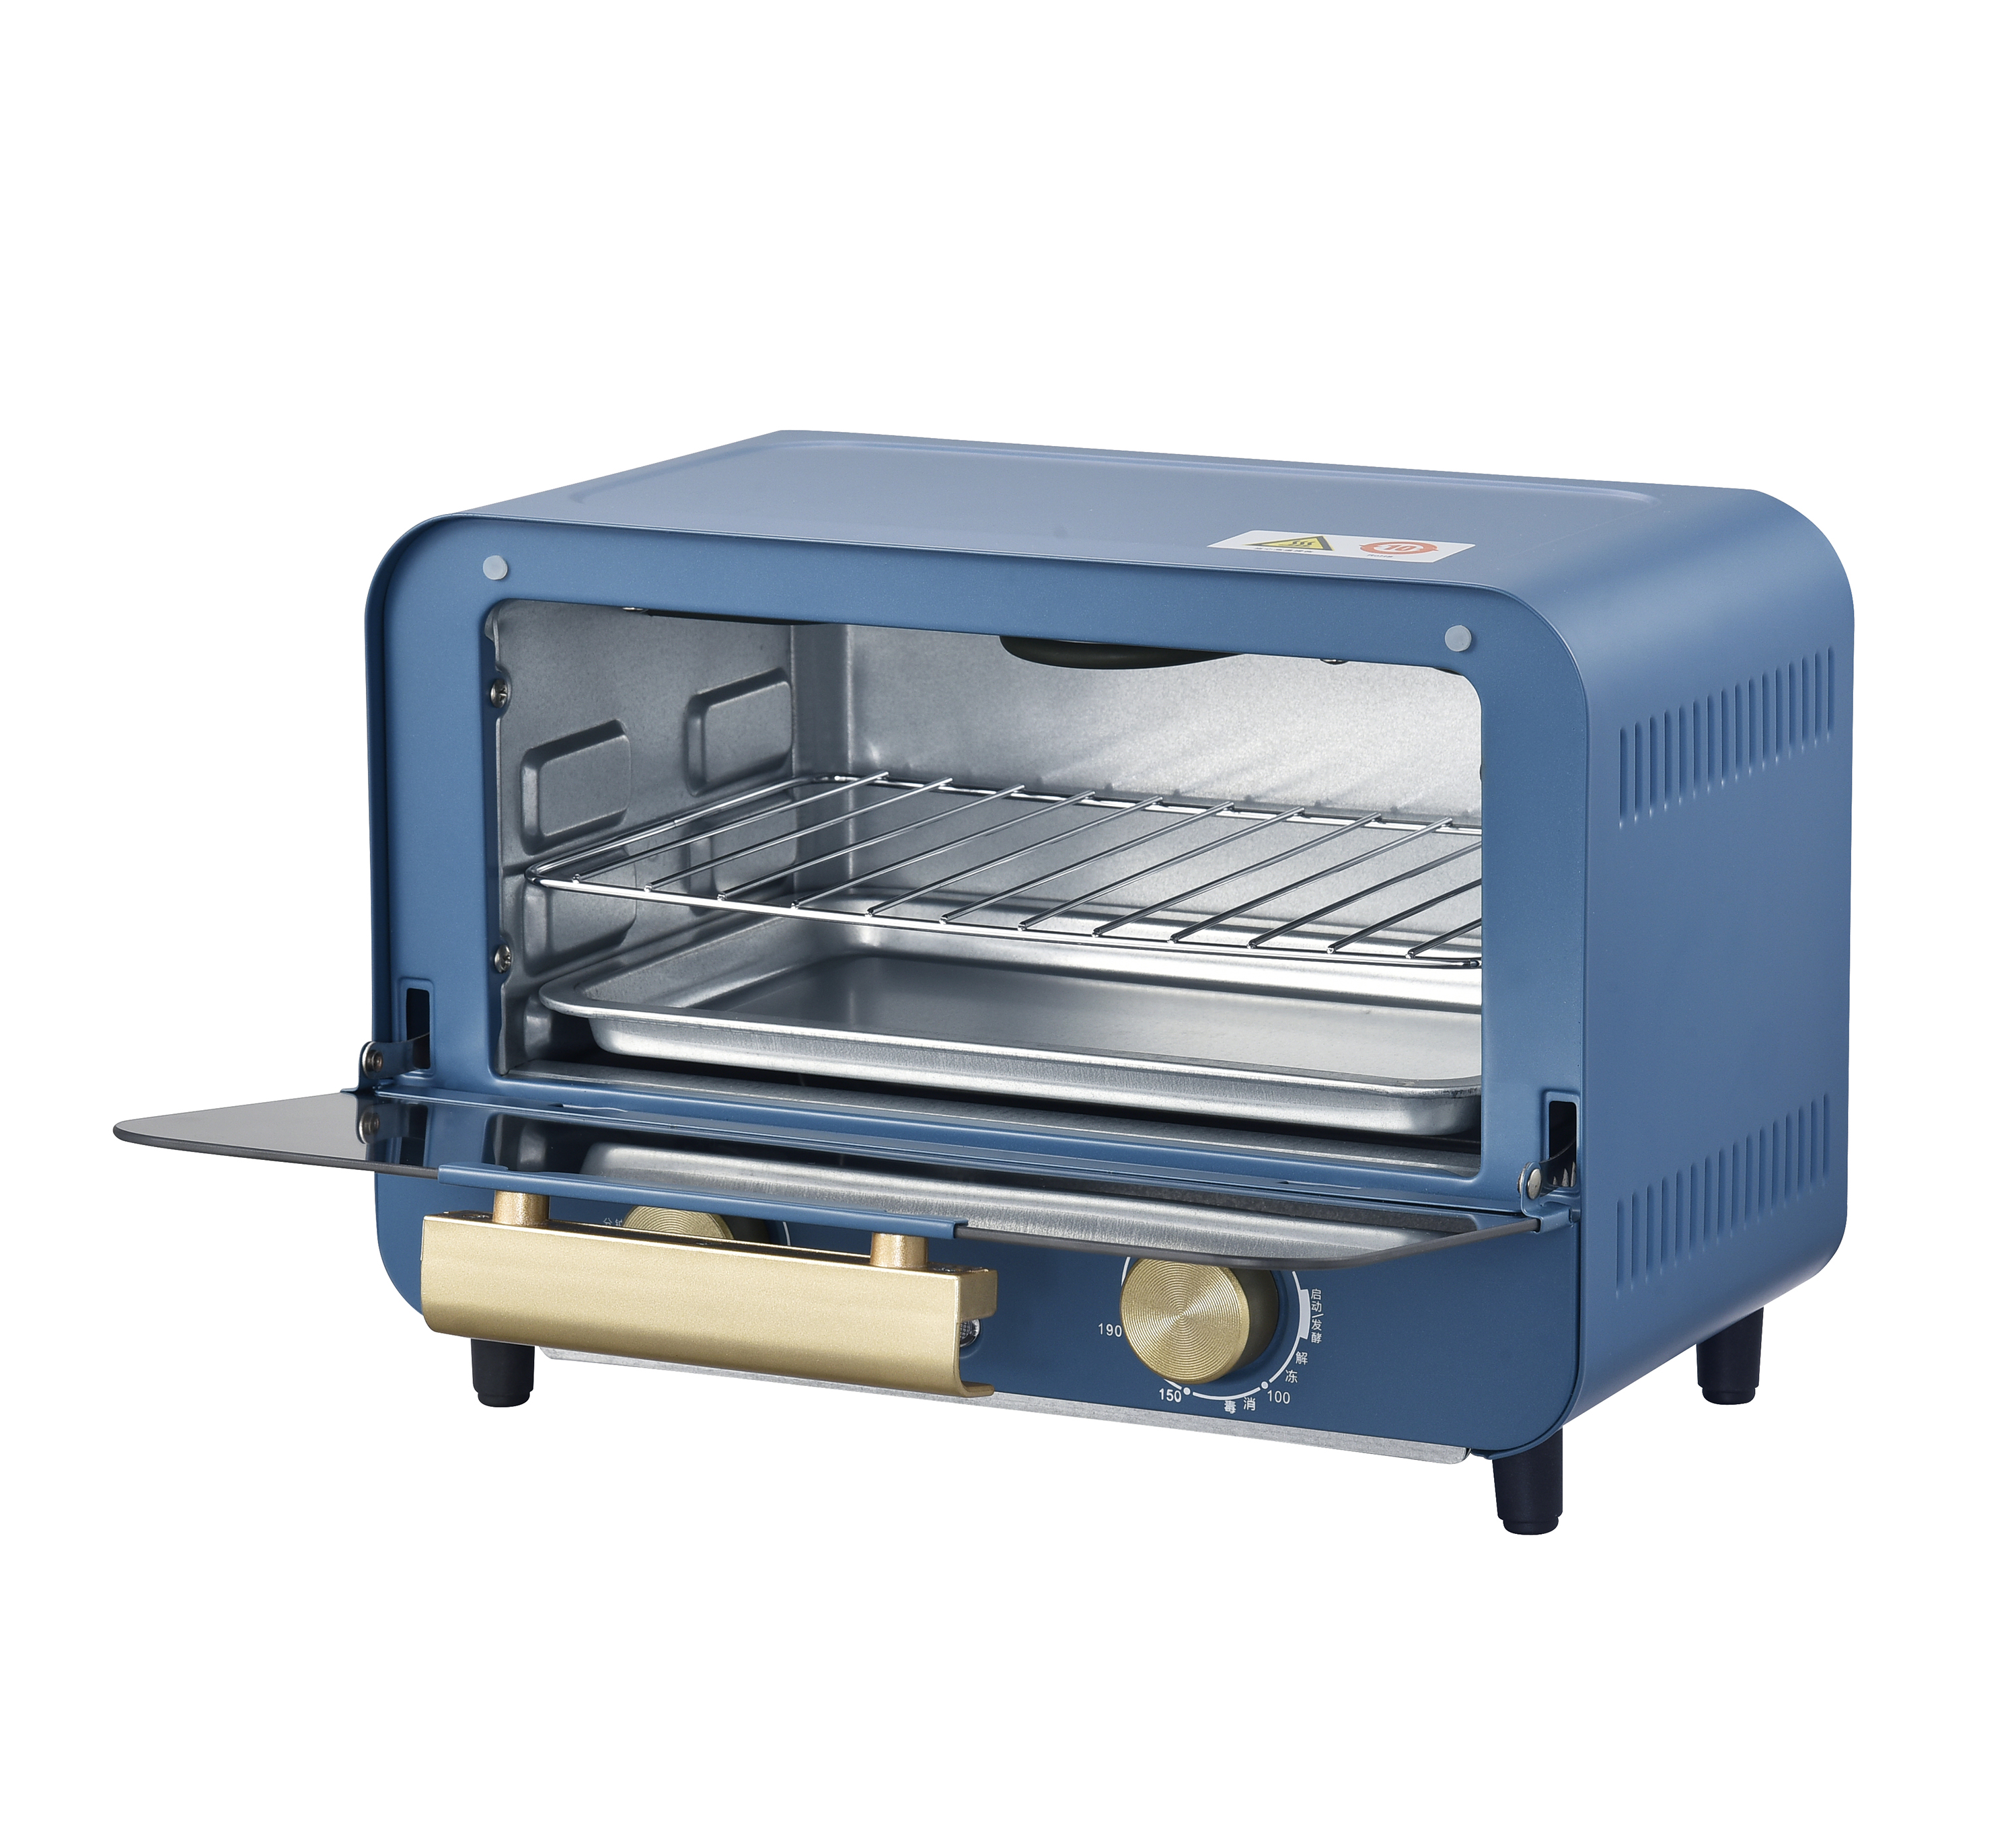 12L colorful bread pizza oven electric oven